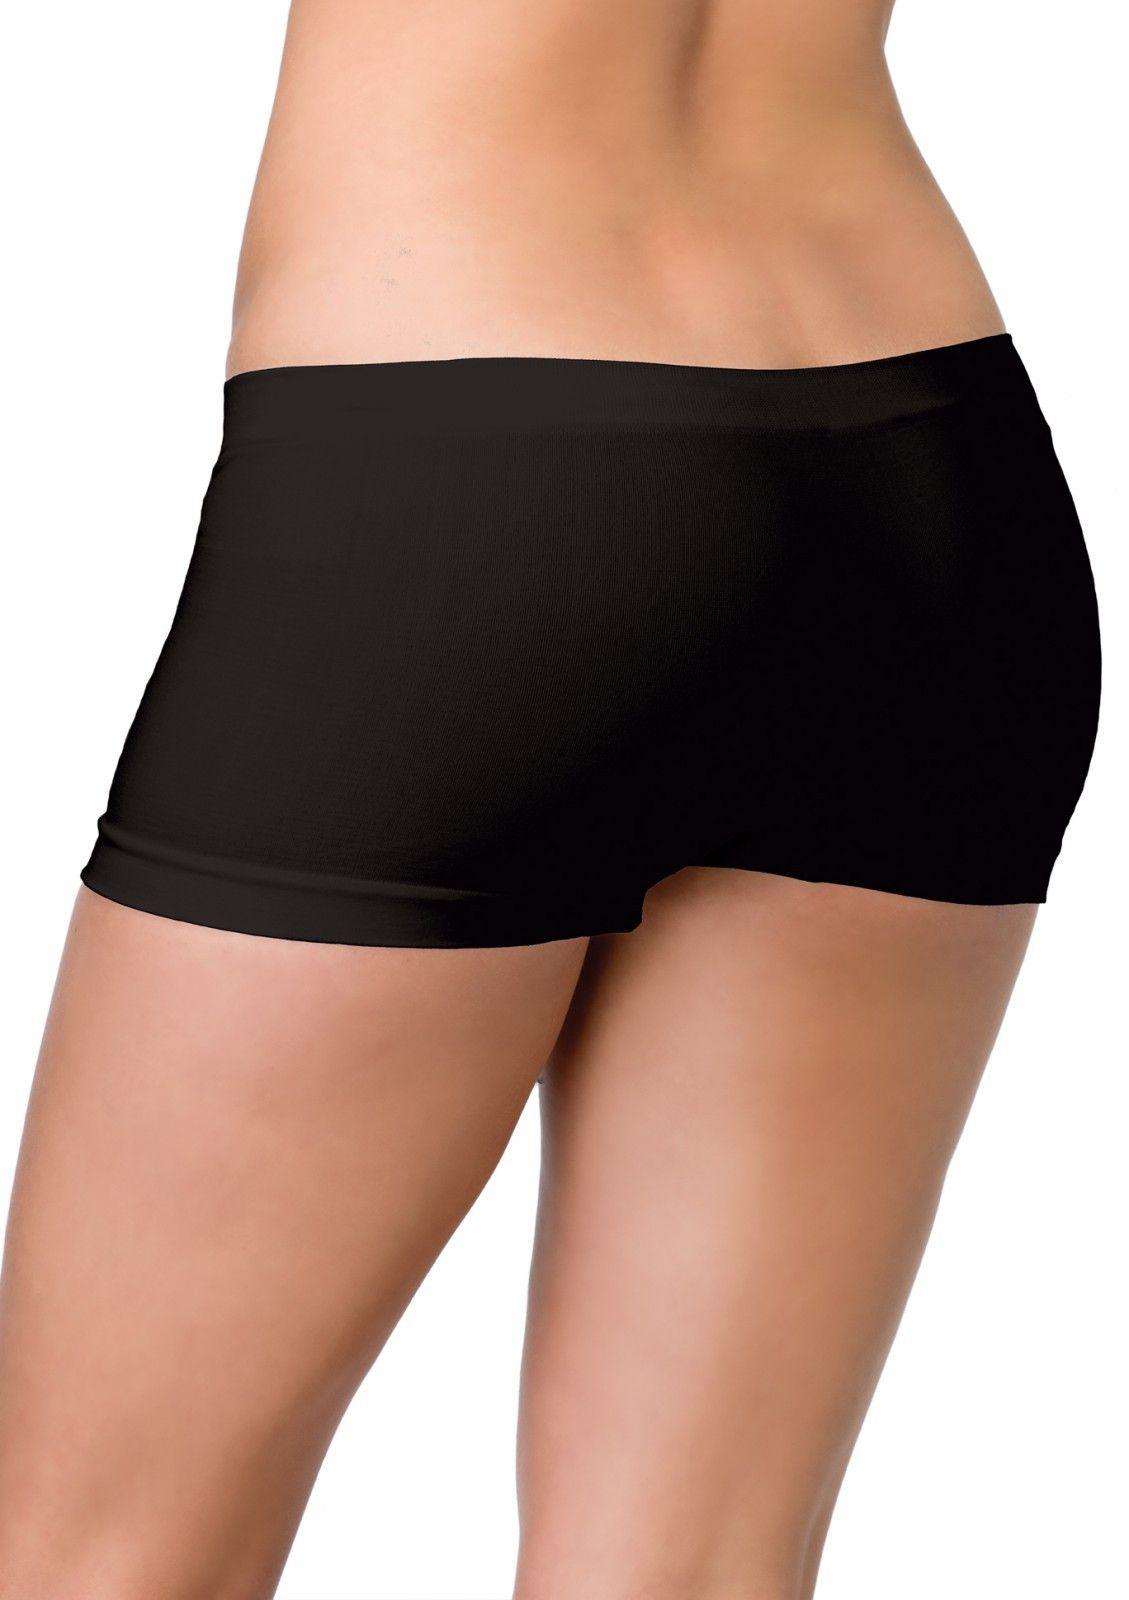 Naadloze Shorts Zwart Vrouw